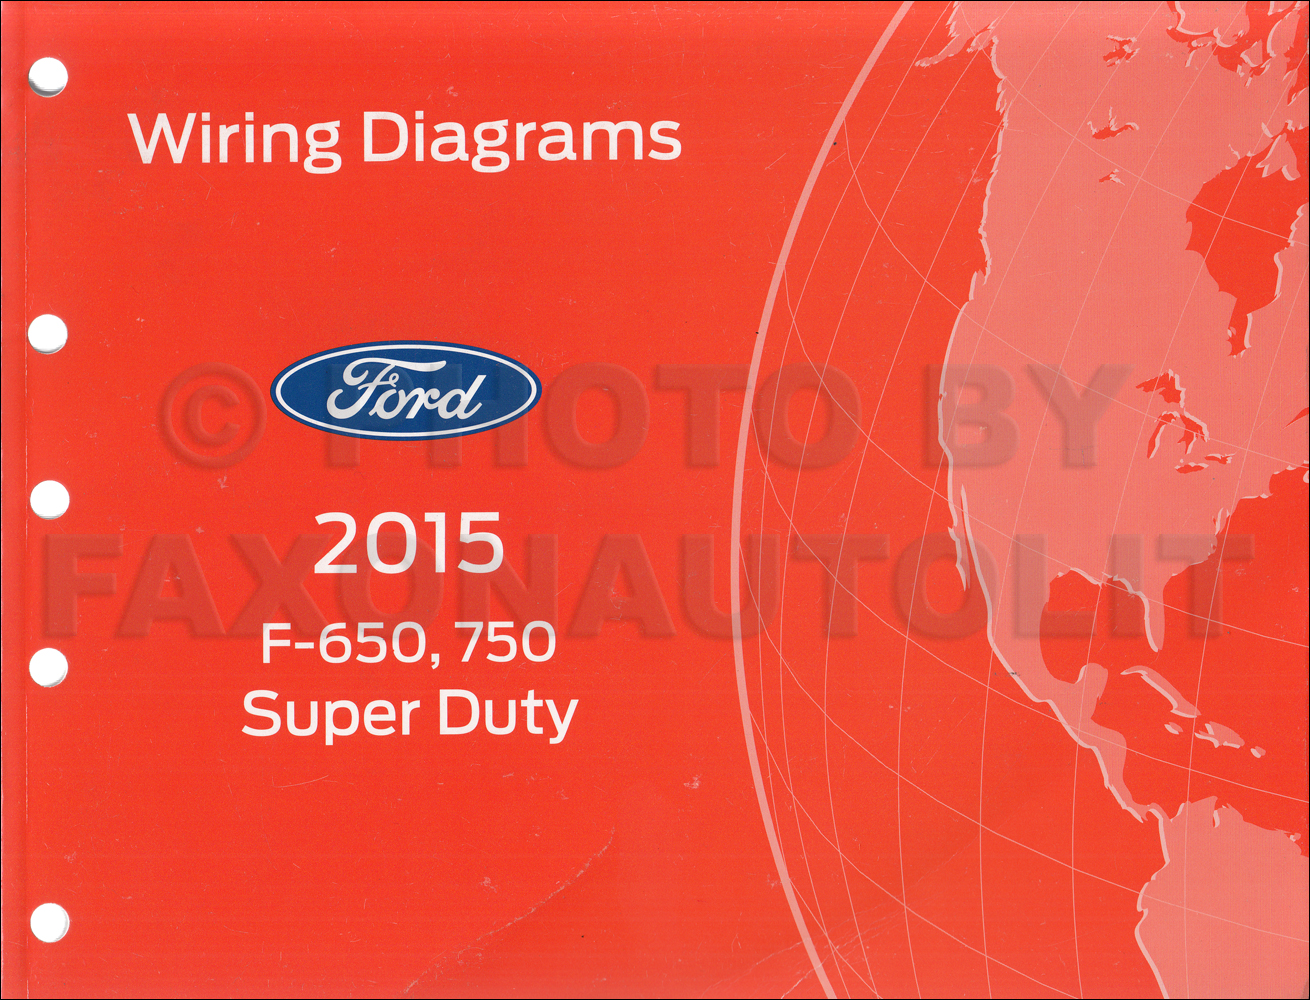 GH_7931] 2015 Ford F750 Wiring Schematic Free Diagram | Ford F650 Alt Wiring |  | Ilari Xlexi Viewor Mohammedshrine Librar Wiring 101